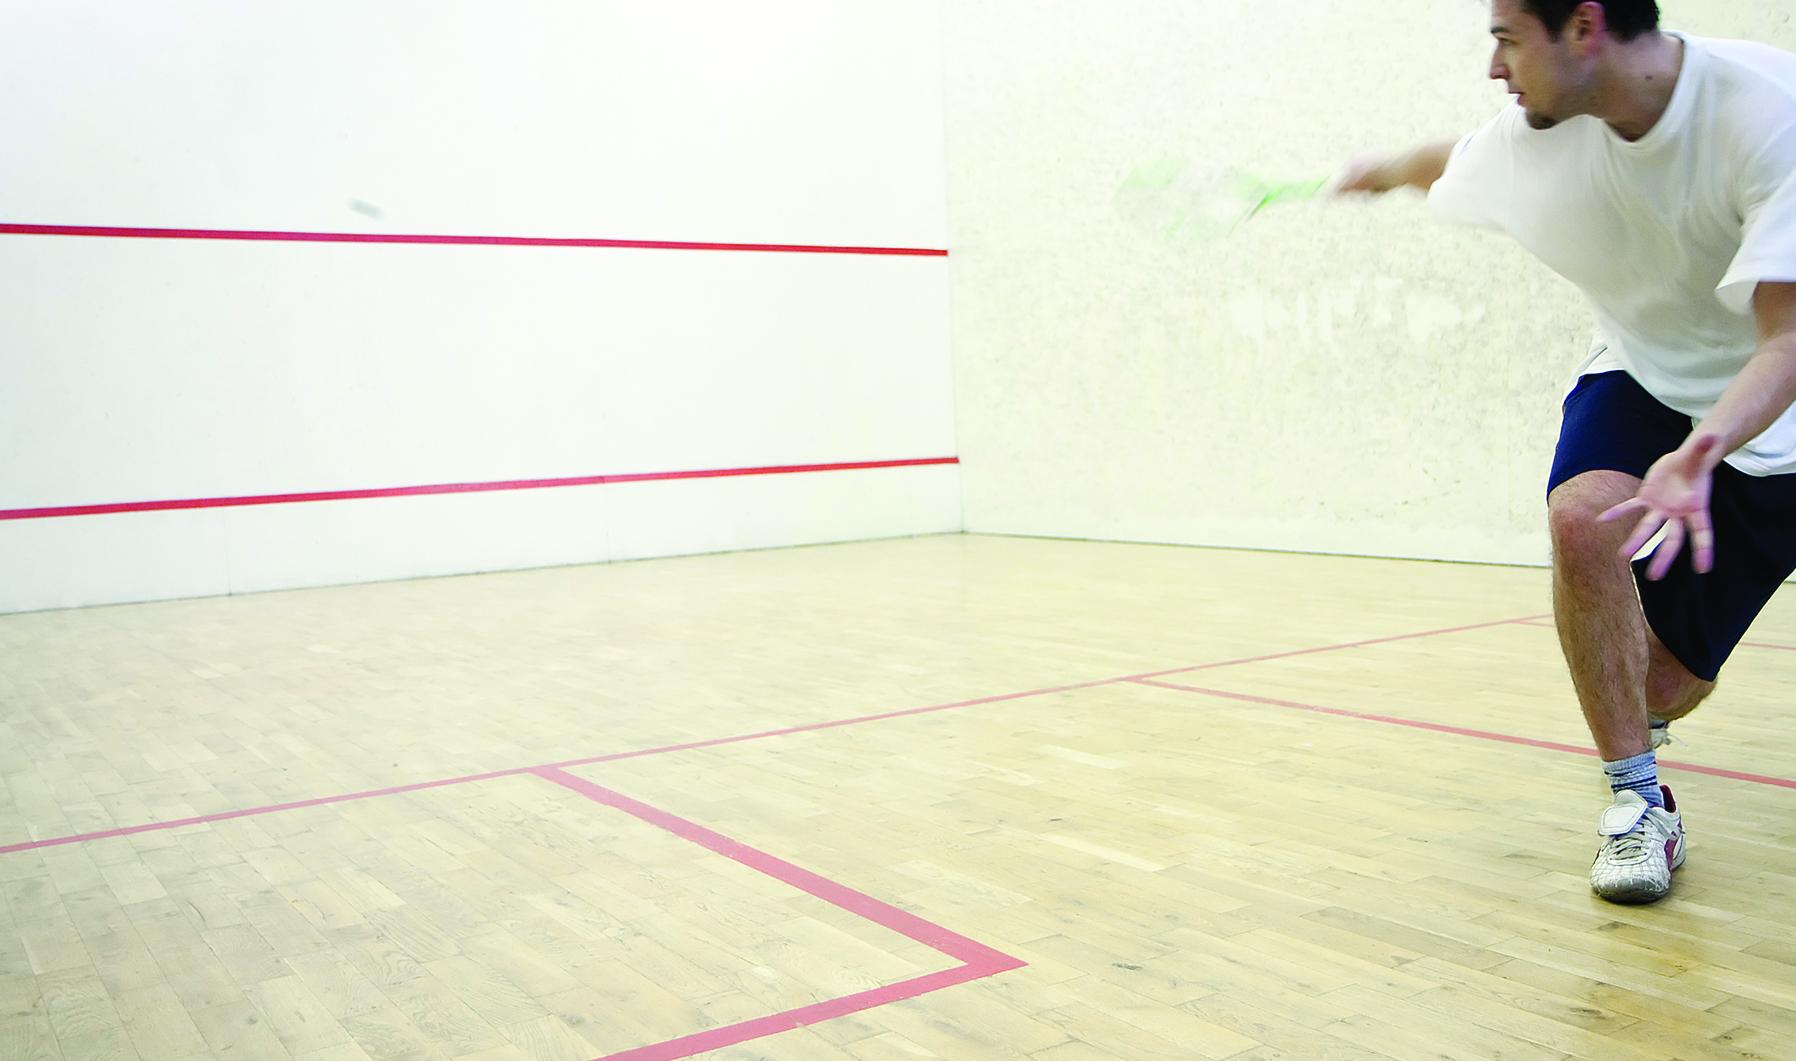 Courtlite Racketball Court Lighting